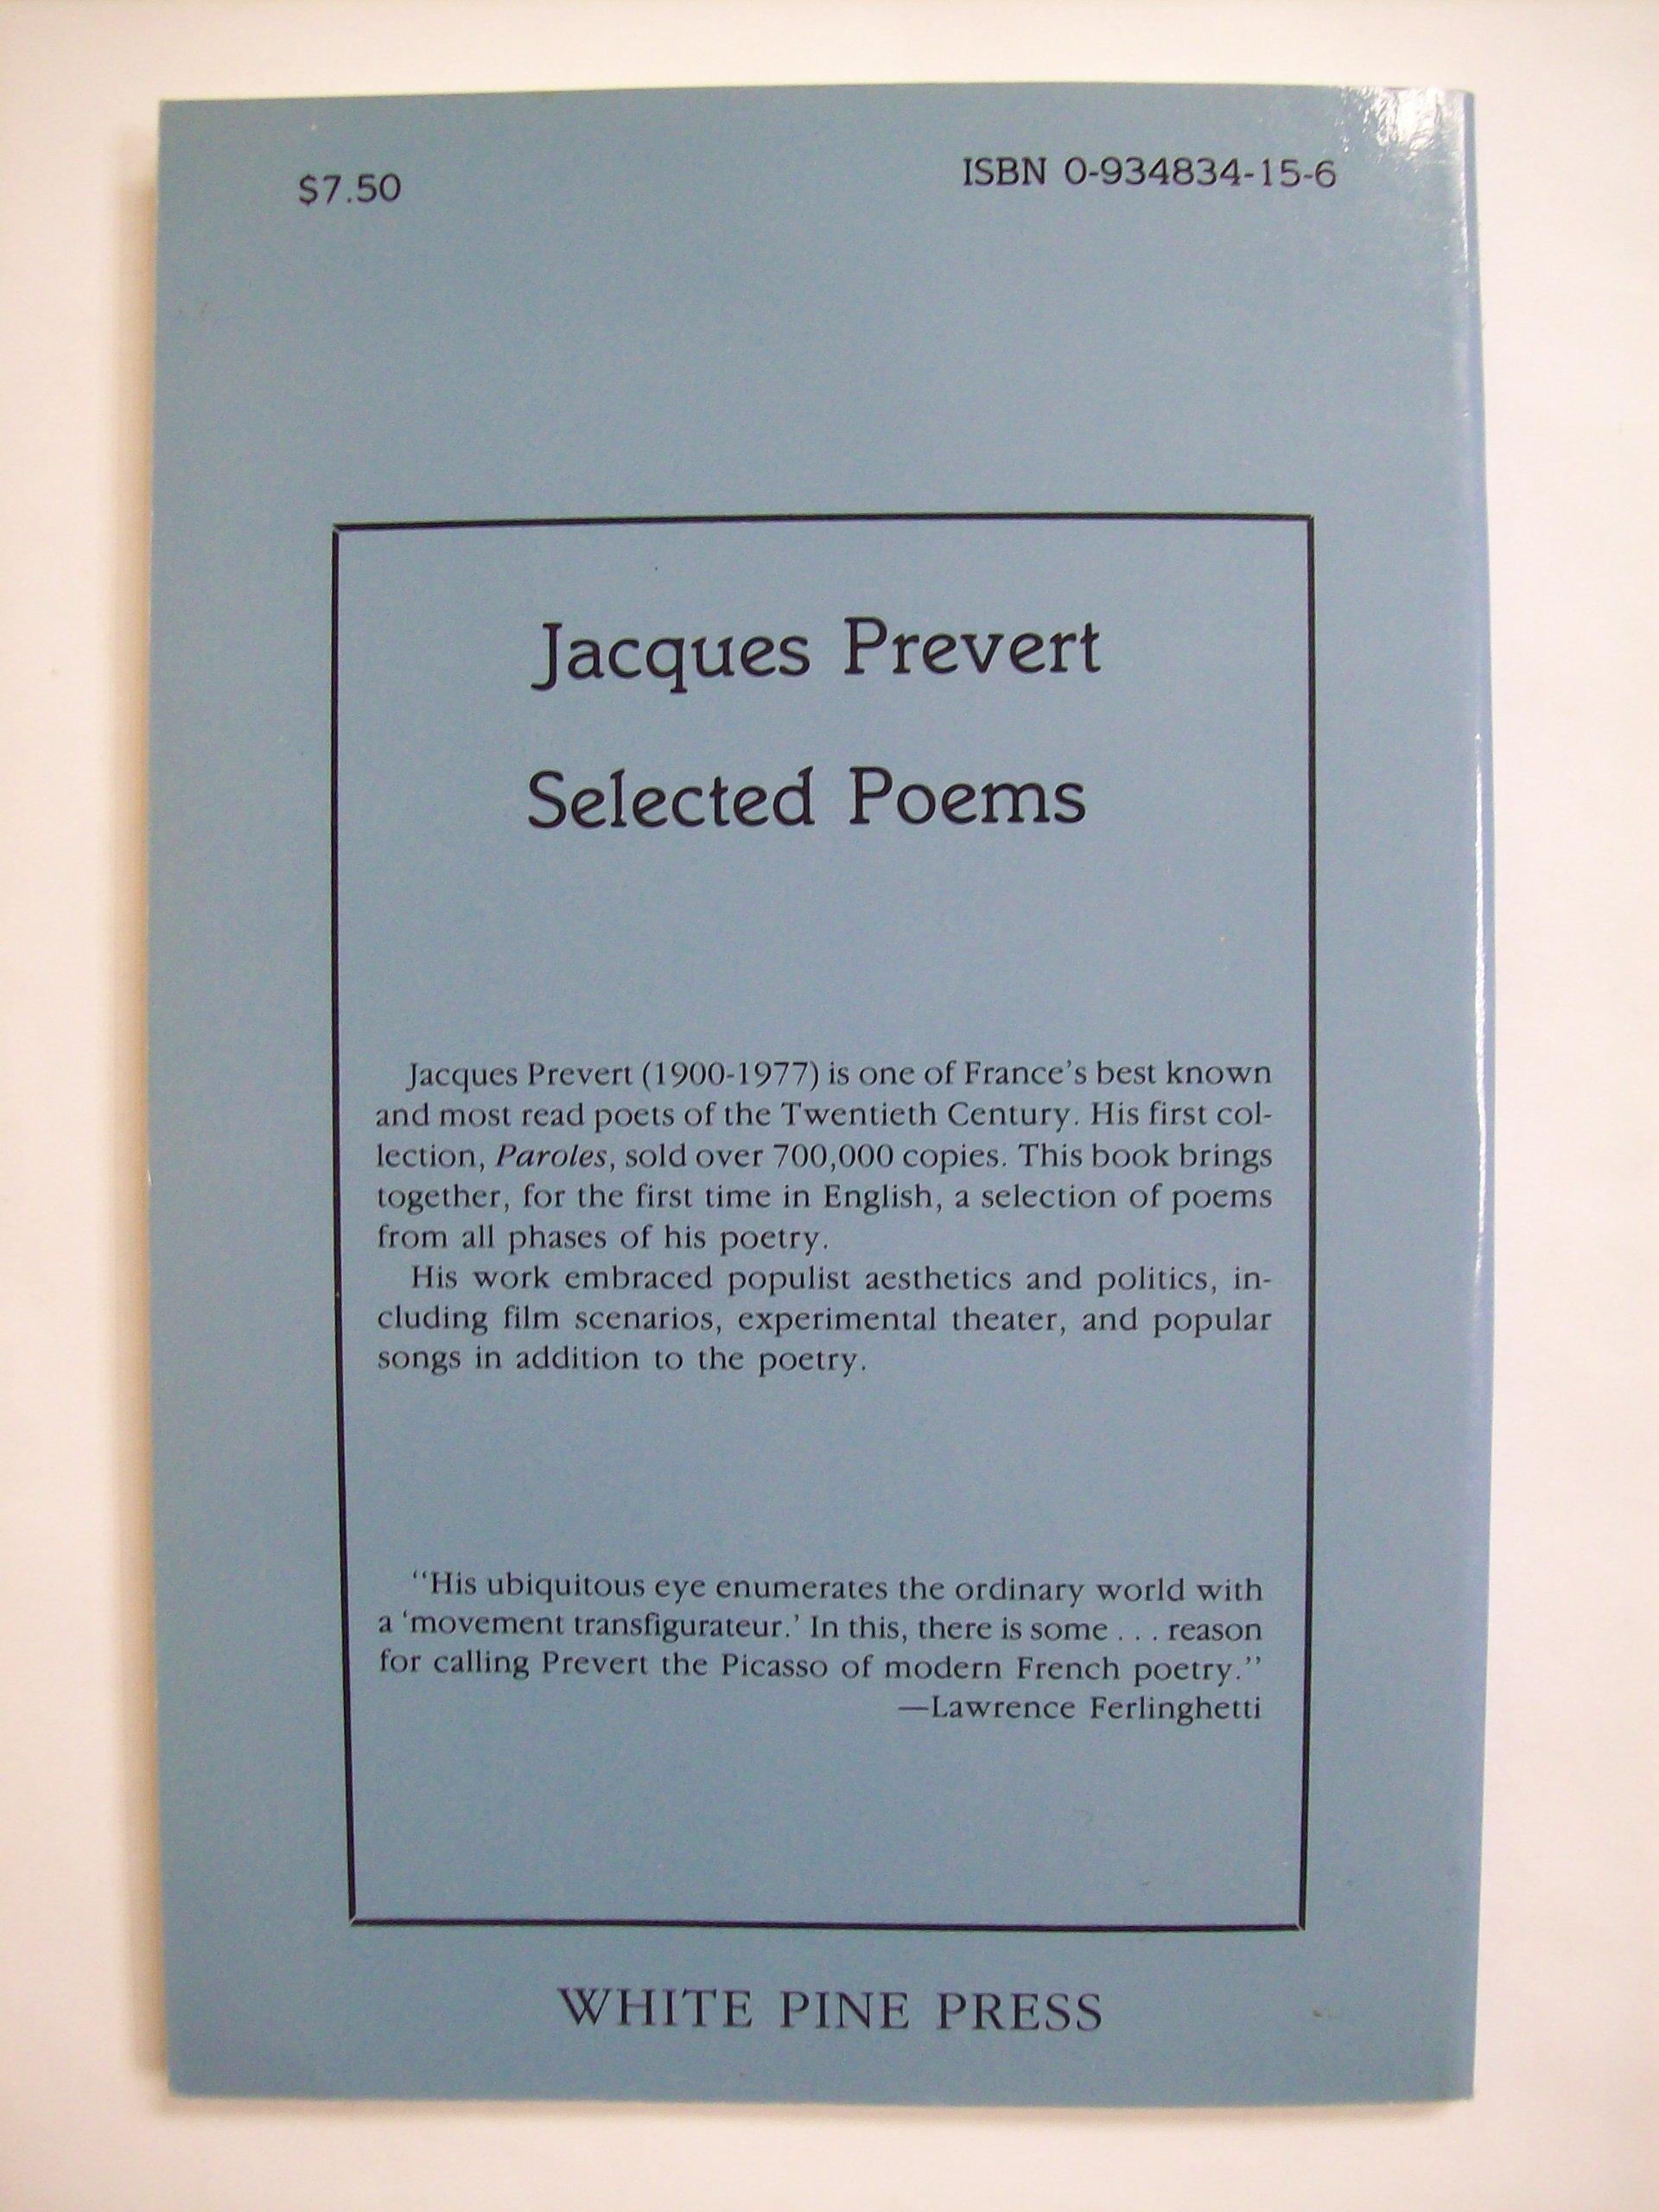 Jacques Prevert Poems 7